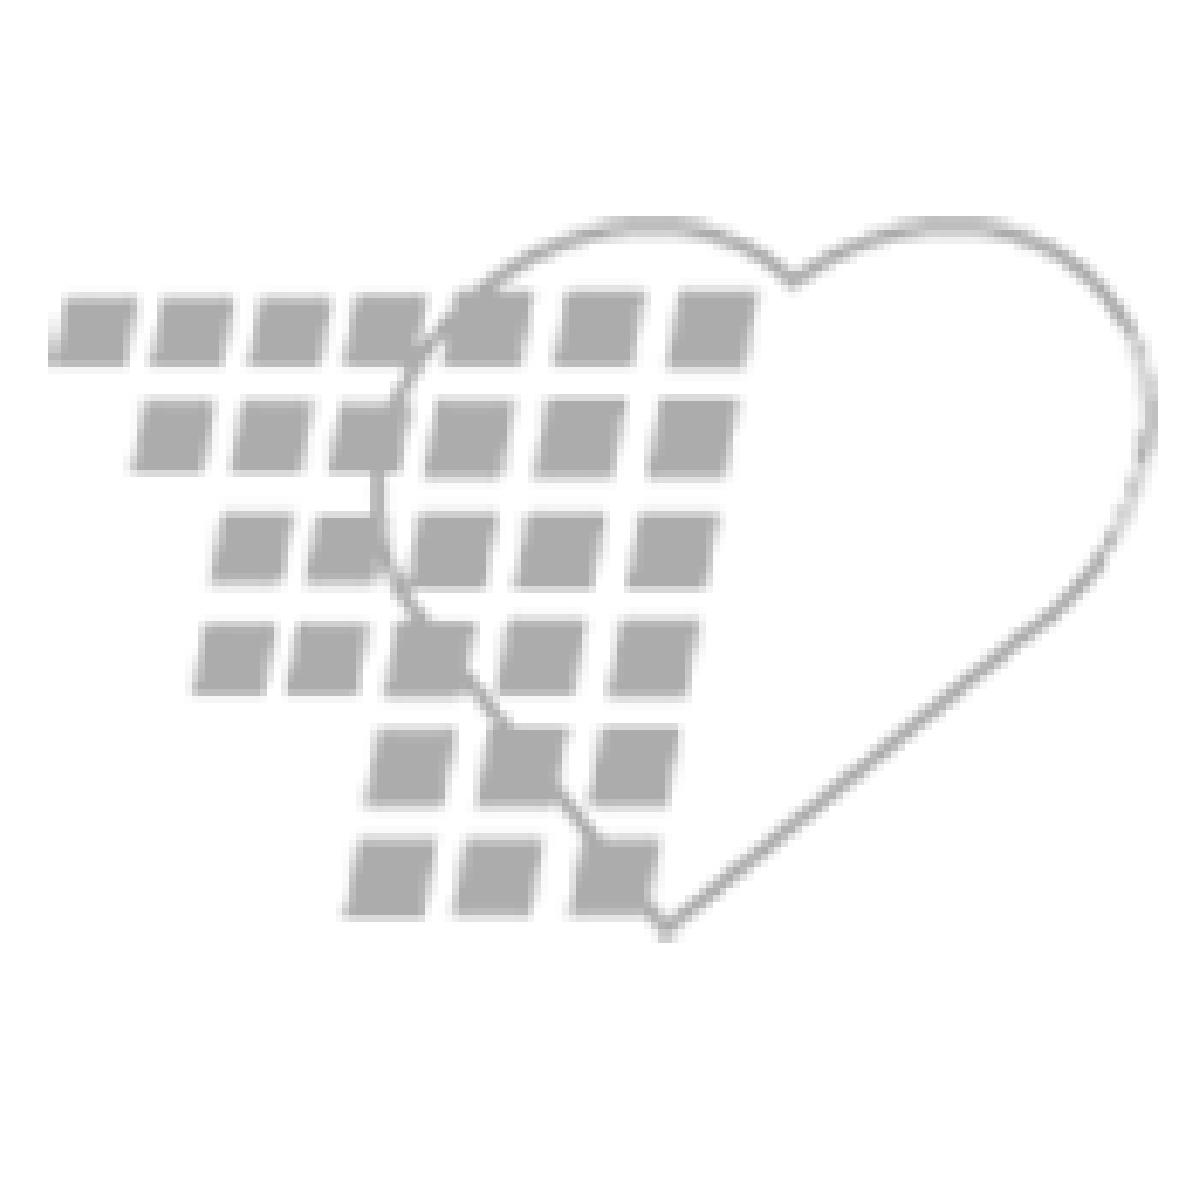 06-82-1000-BARI - NoNo Sleeve -Bariatric